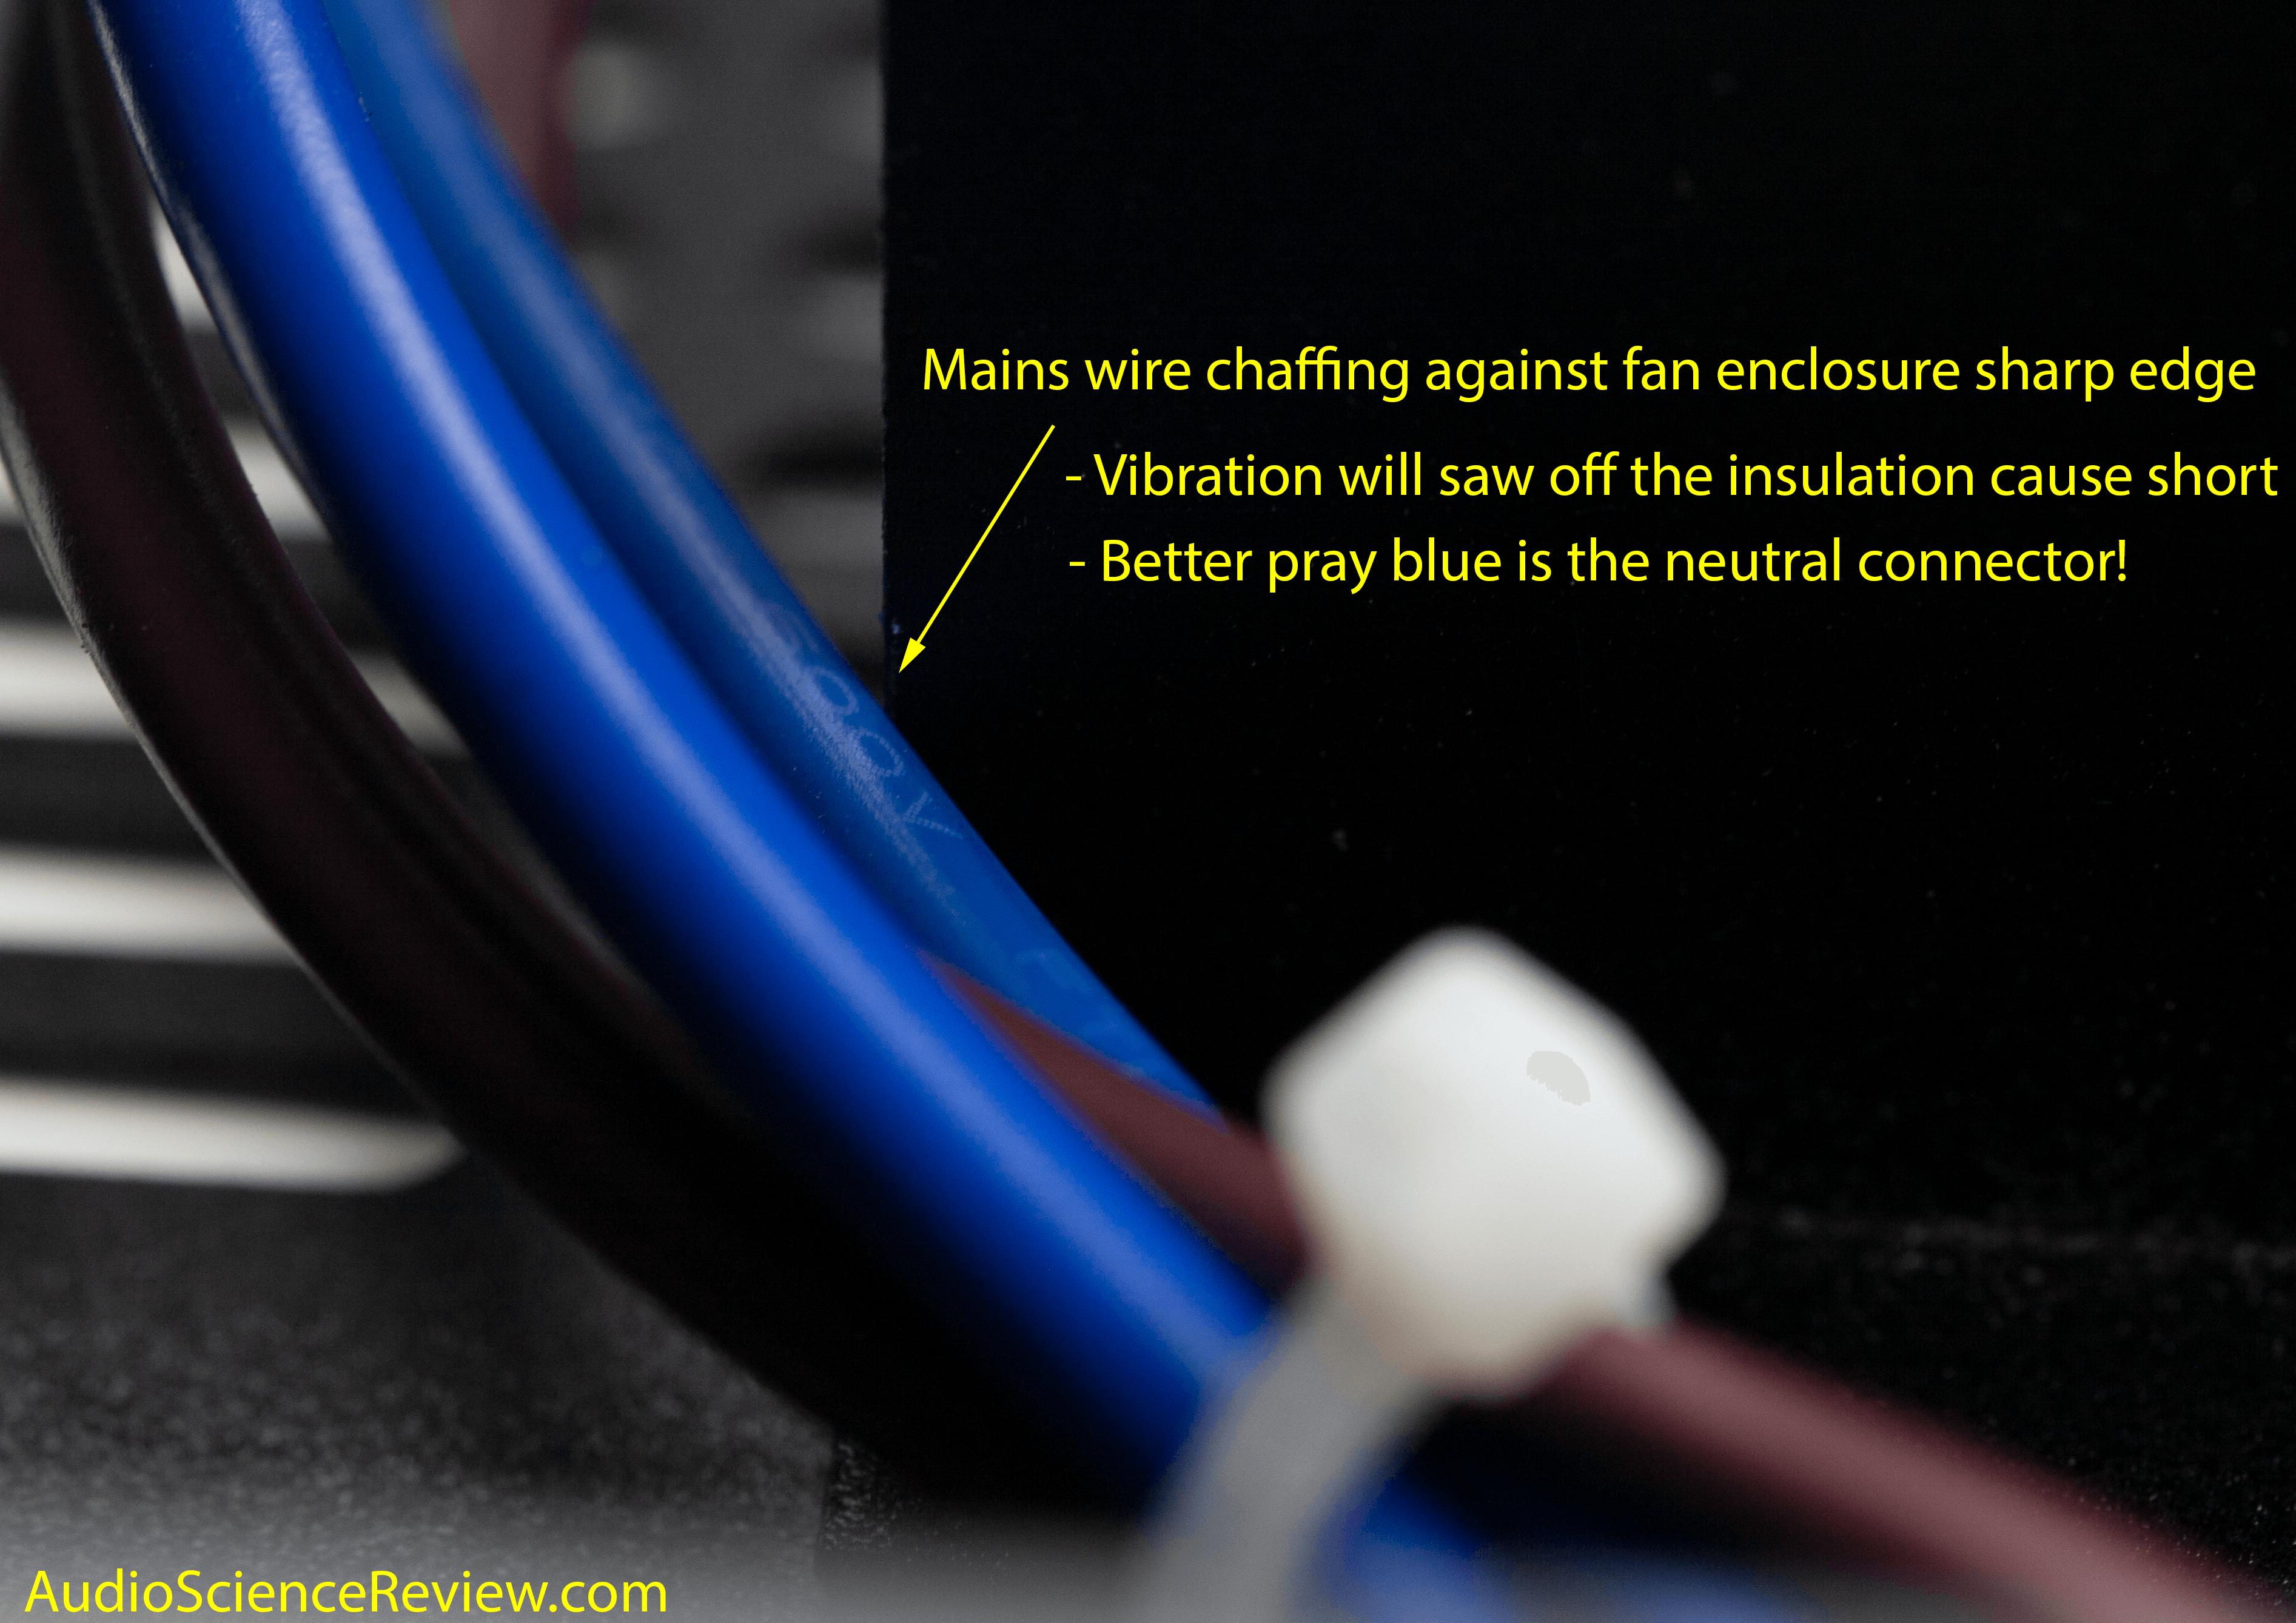 Monoprice 605030 pro amplifier class D teardown wire touching case.png